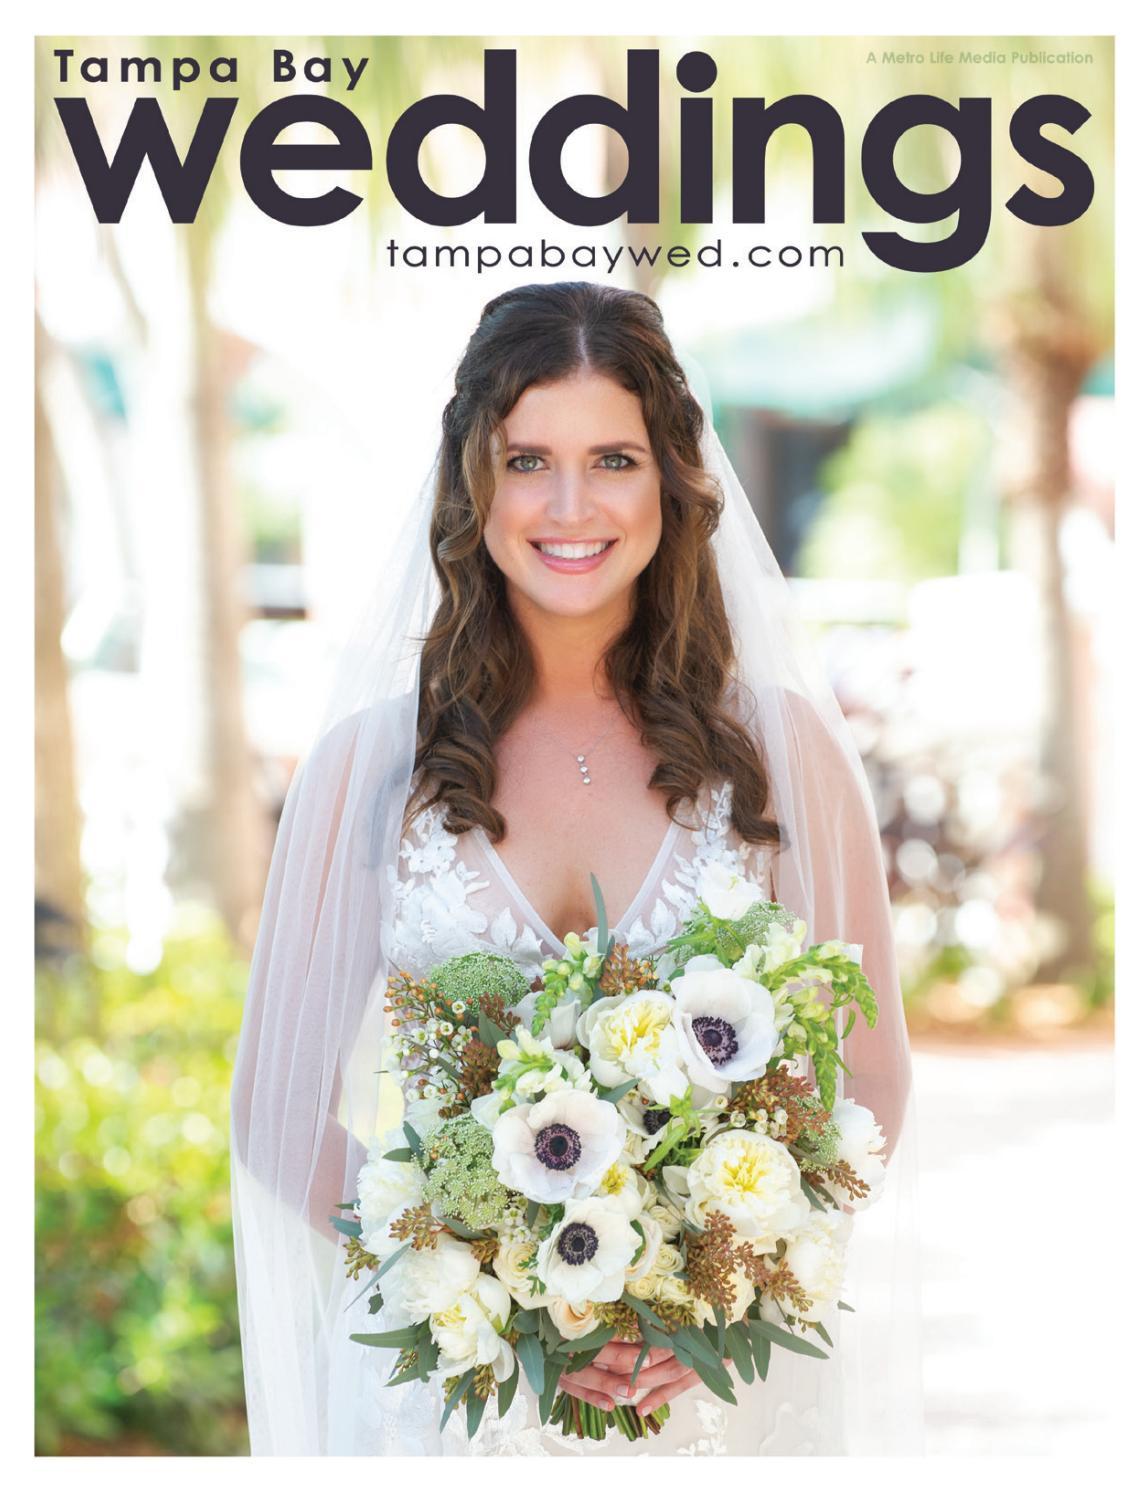 Tampa Bay Weddings By Metro Life Media Inc Issuu